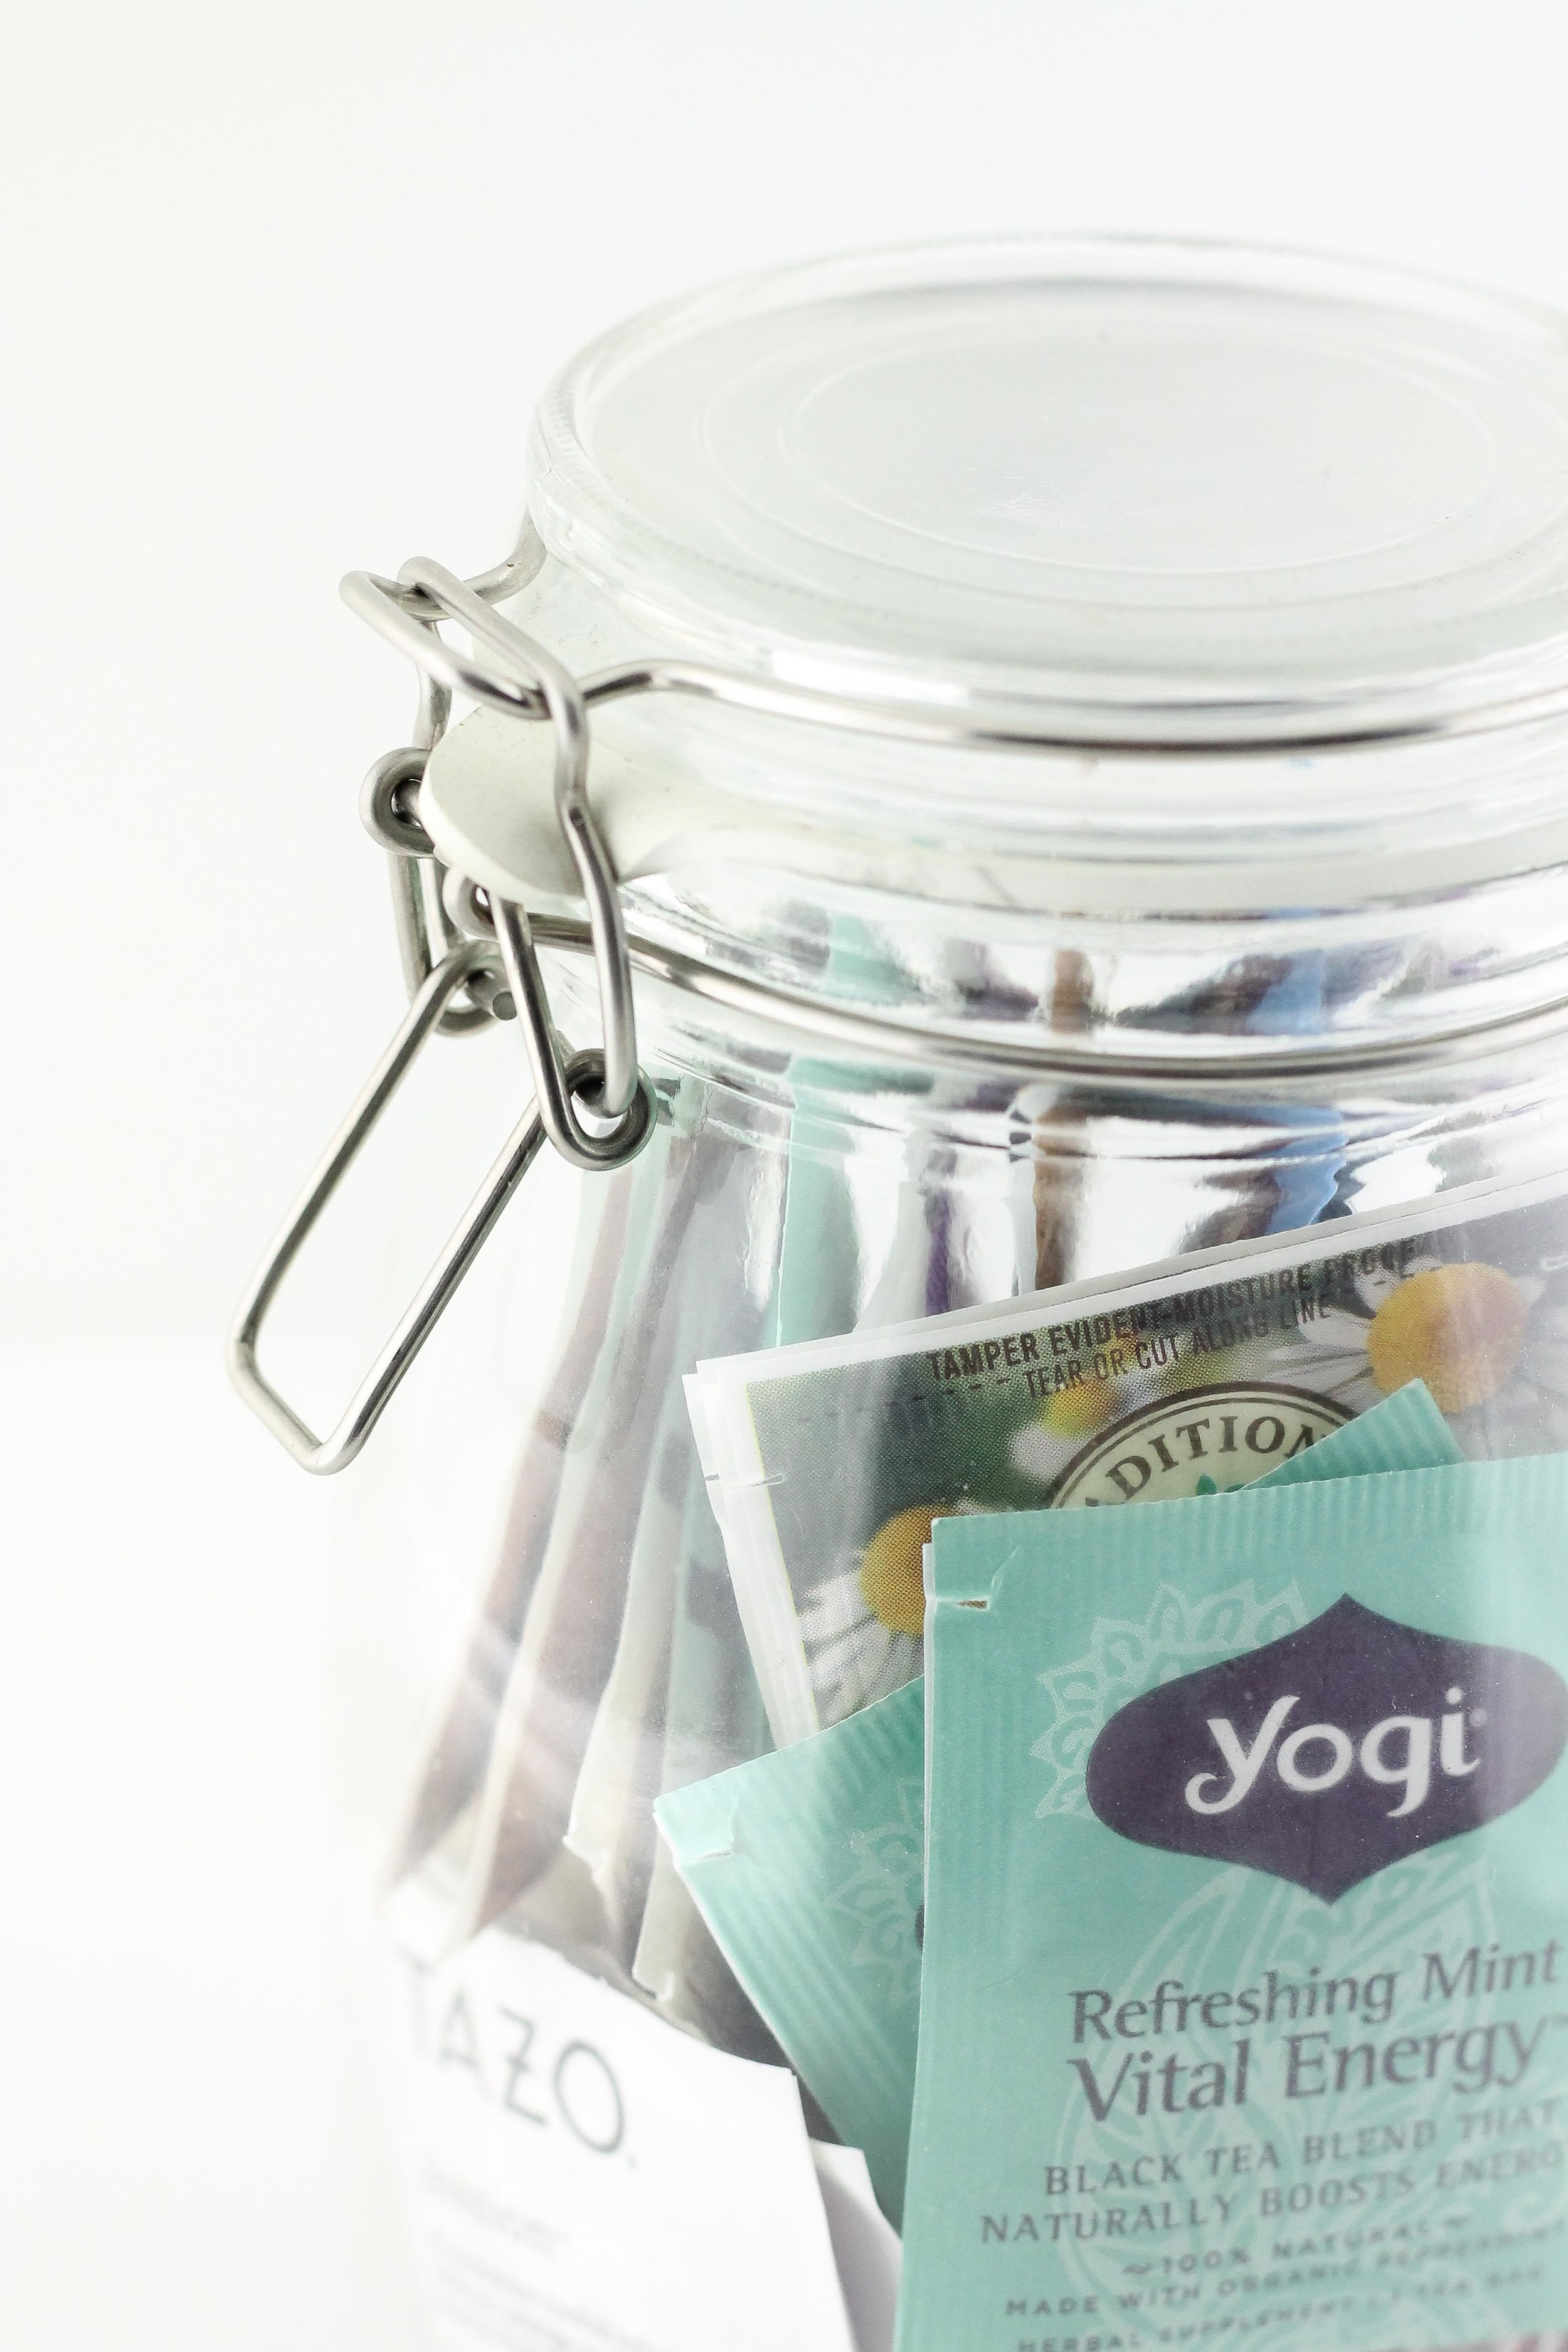 Herbal teas, nighty night tea, caffeine free, healthy lifestyle, health, nutrition, paleo lifestyle